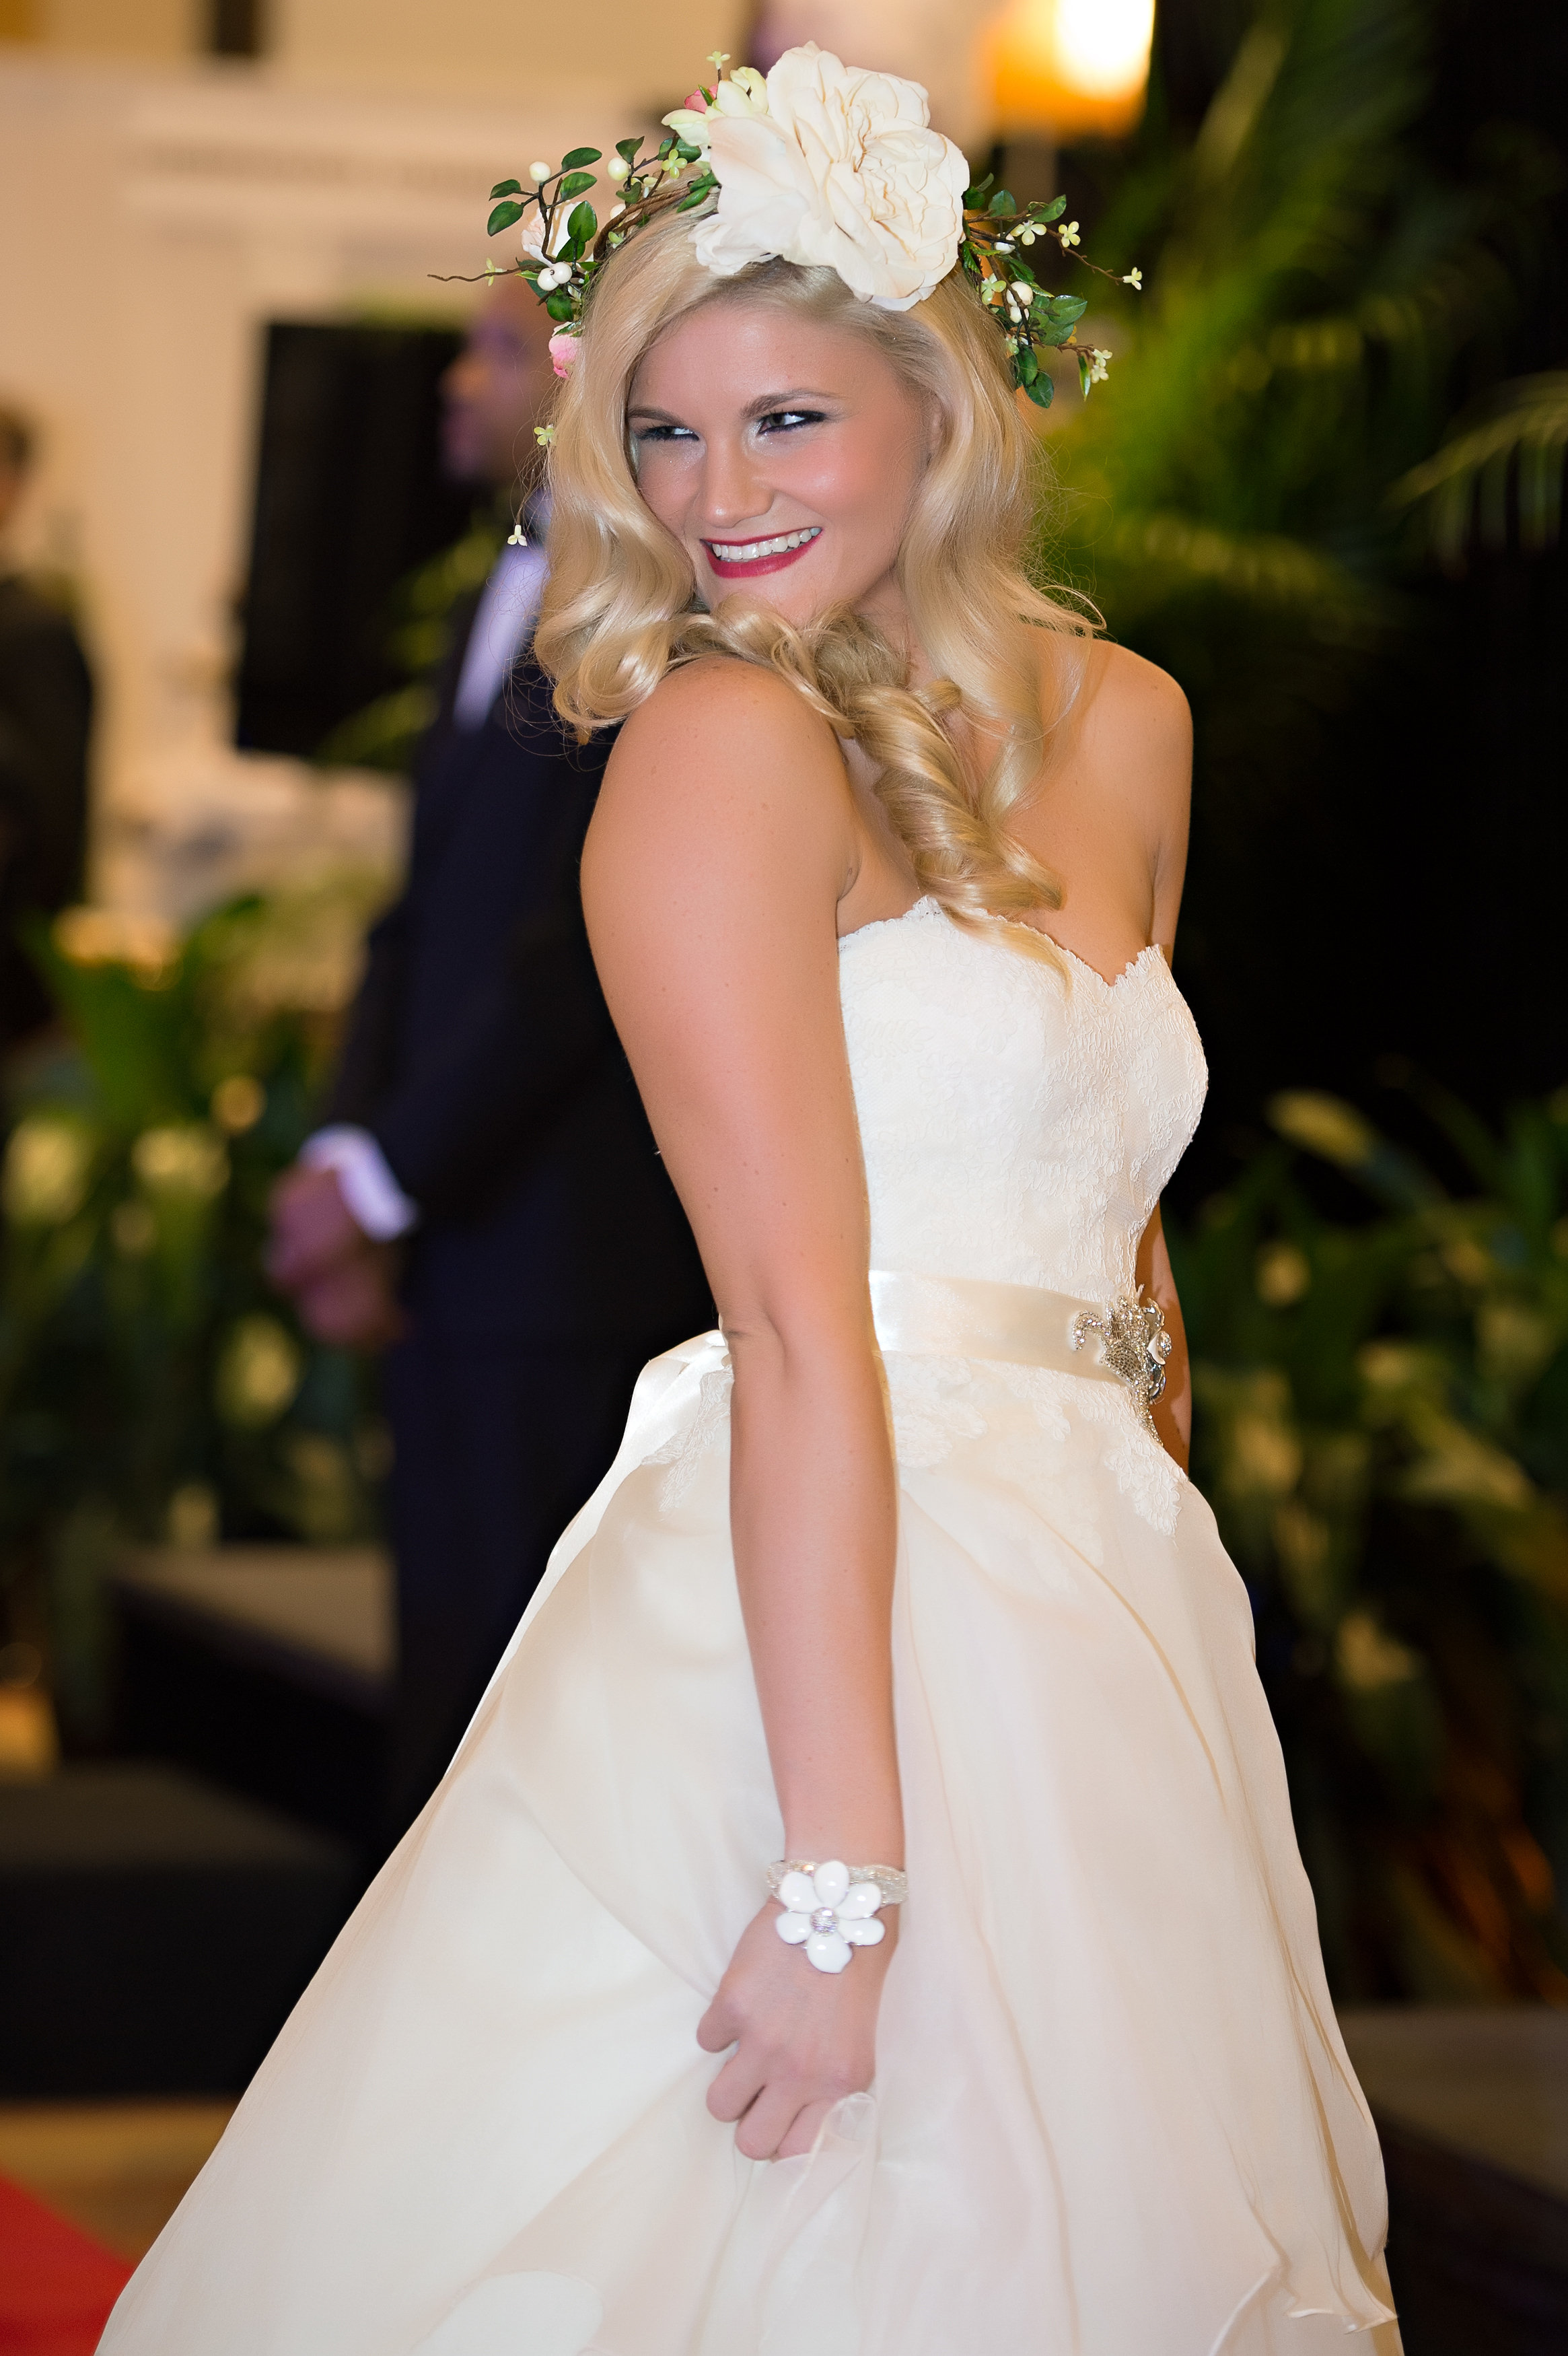 Wedding Dresses Jacksonville: Allure wedding dress style. Best ...